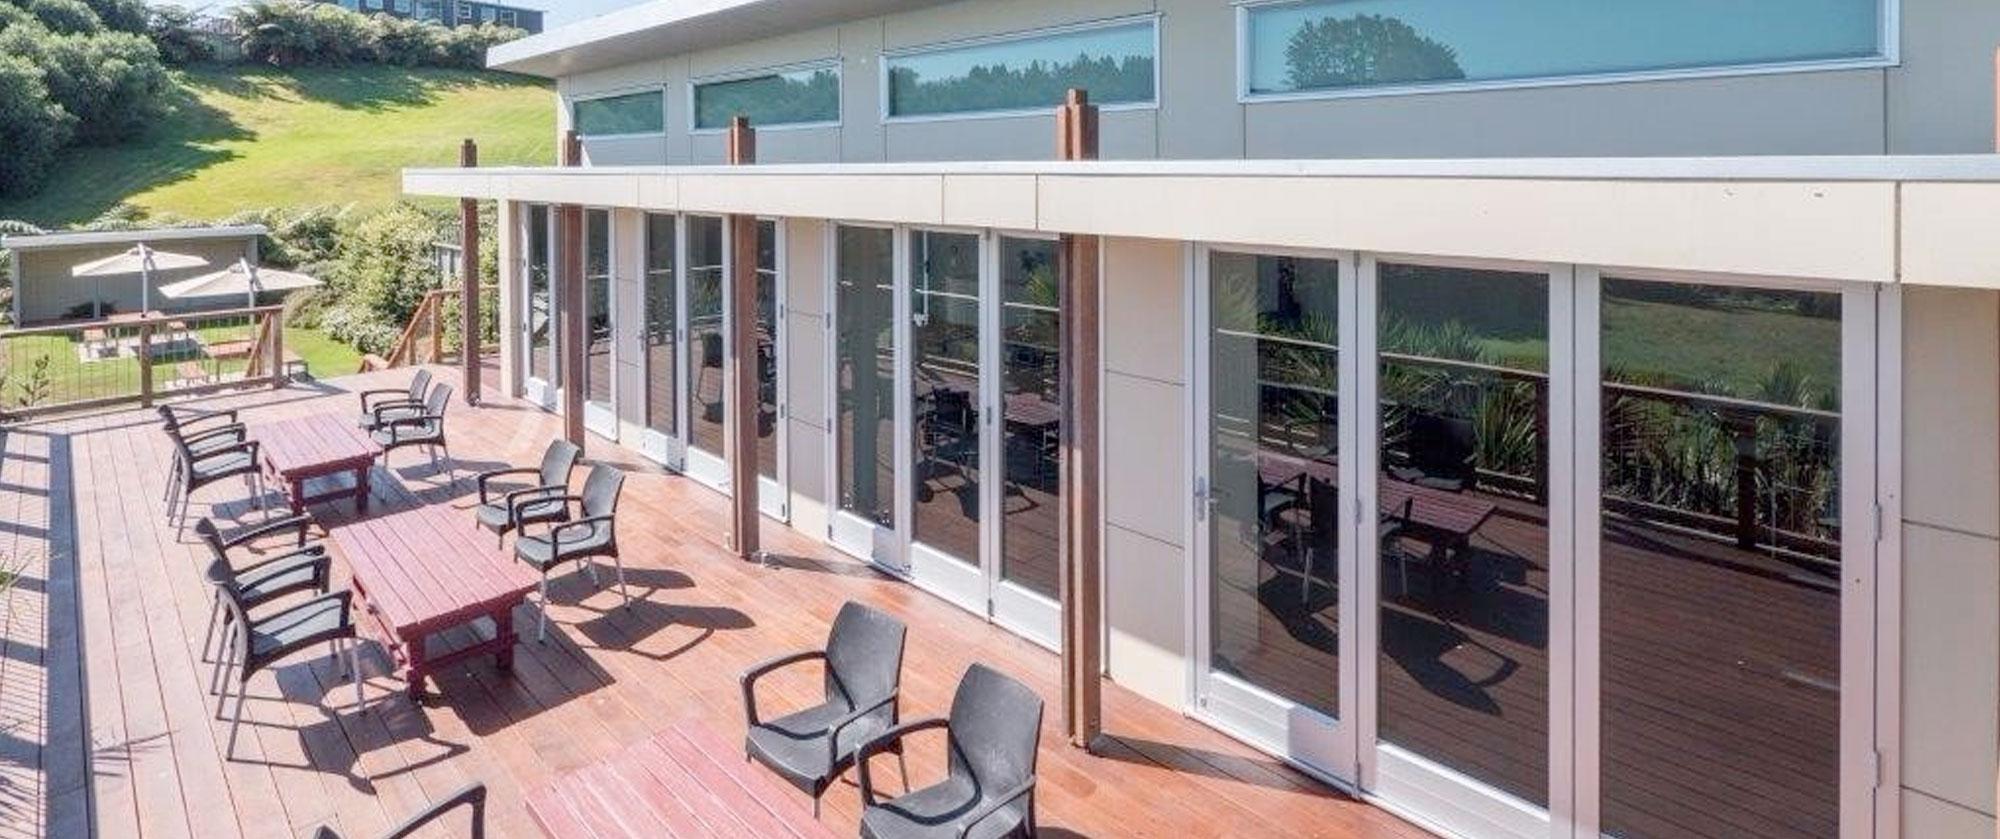 One Burgess Hill - Luxury Accomodation